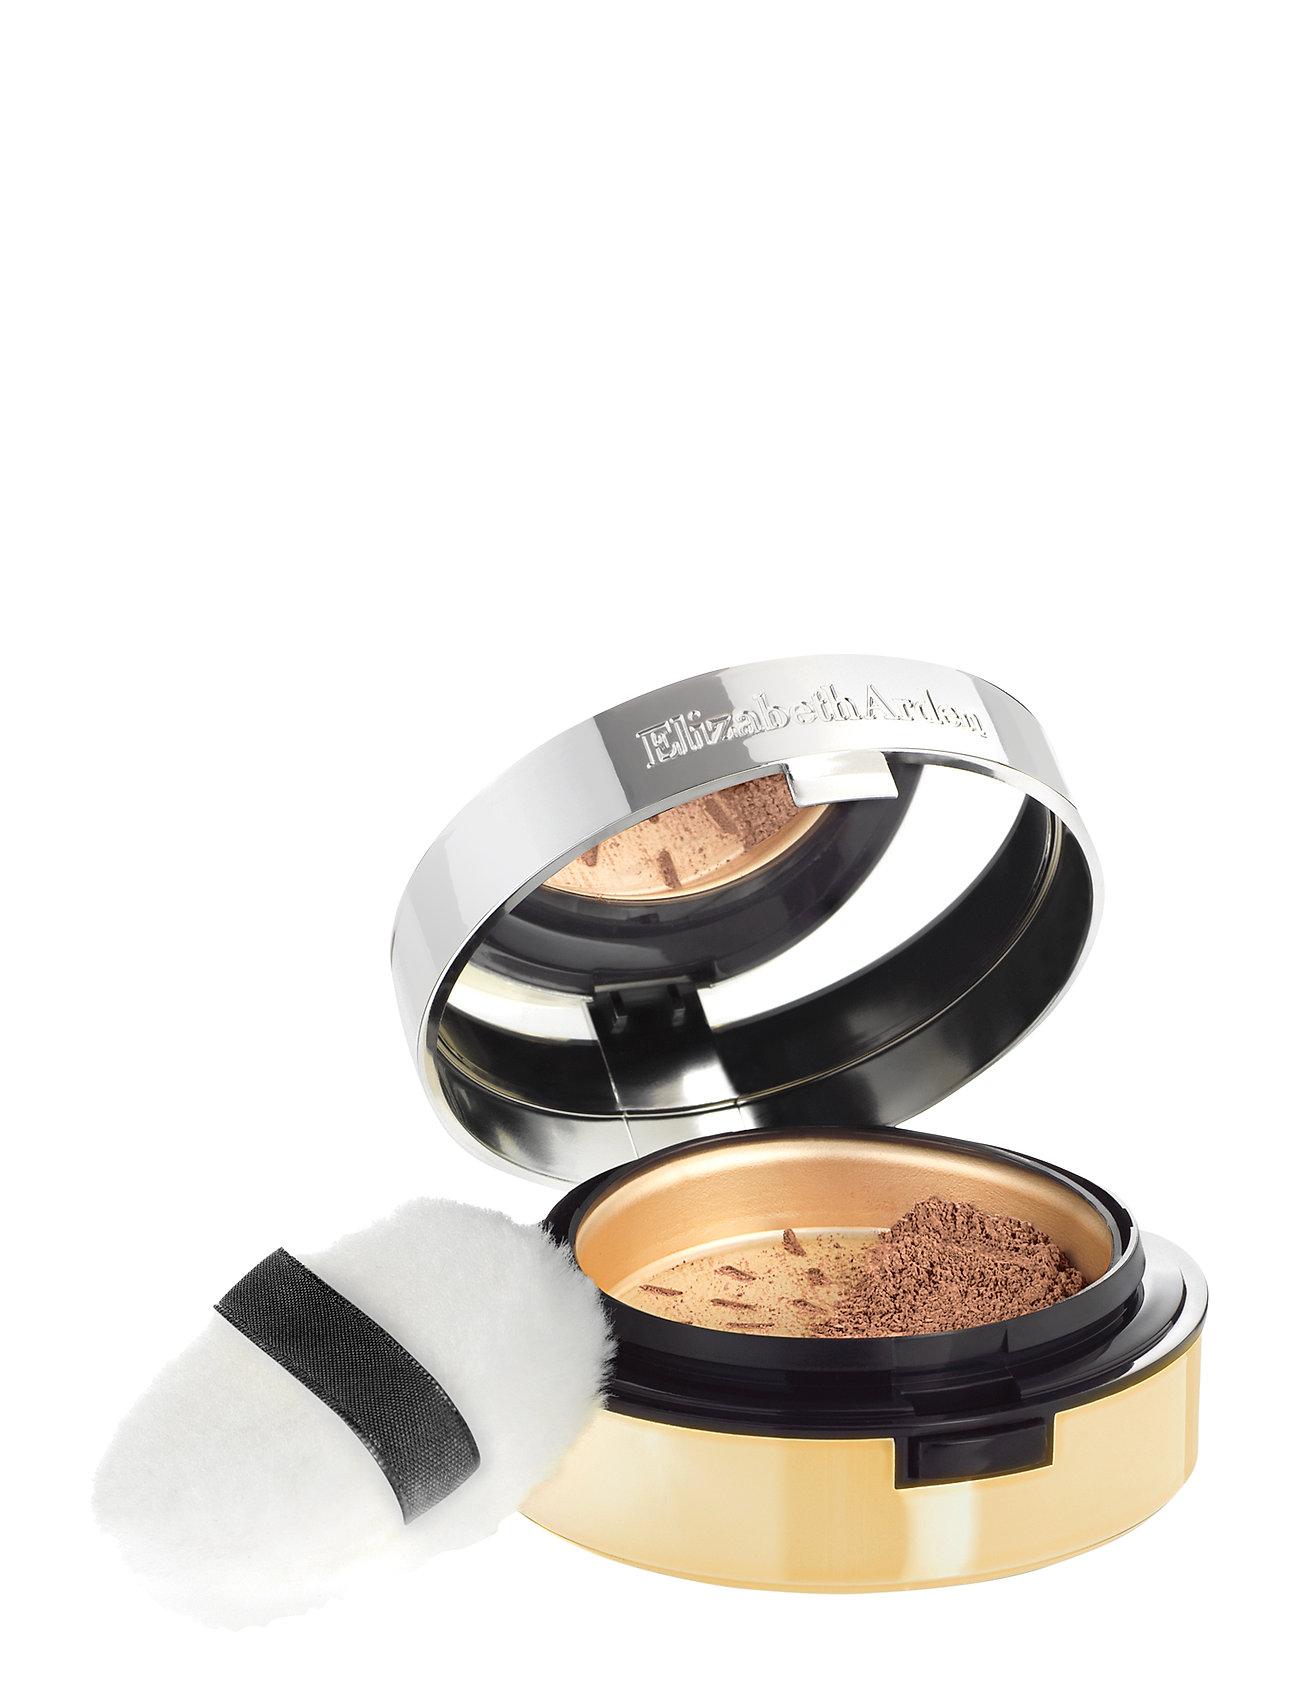 Image of Pure Finish Mineralfoundation 6 Pure Finish Pudder Makeup ELIZABETH ARDEN (3067500919)